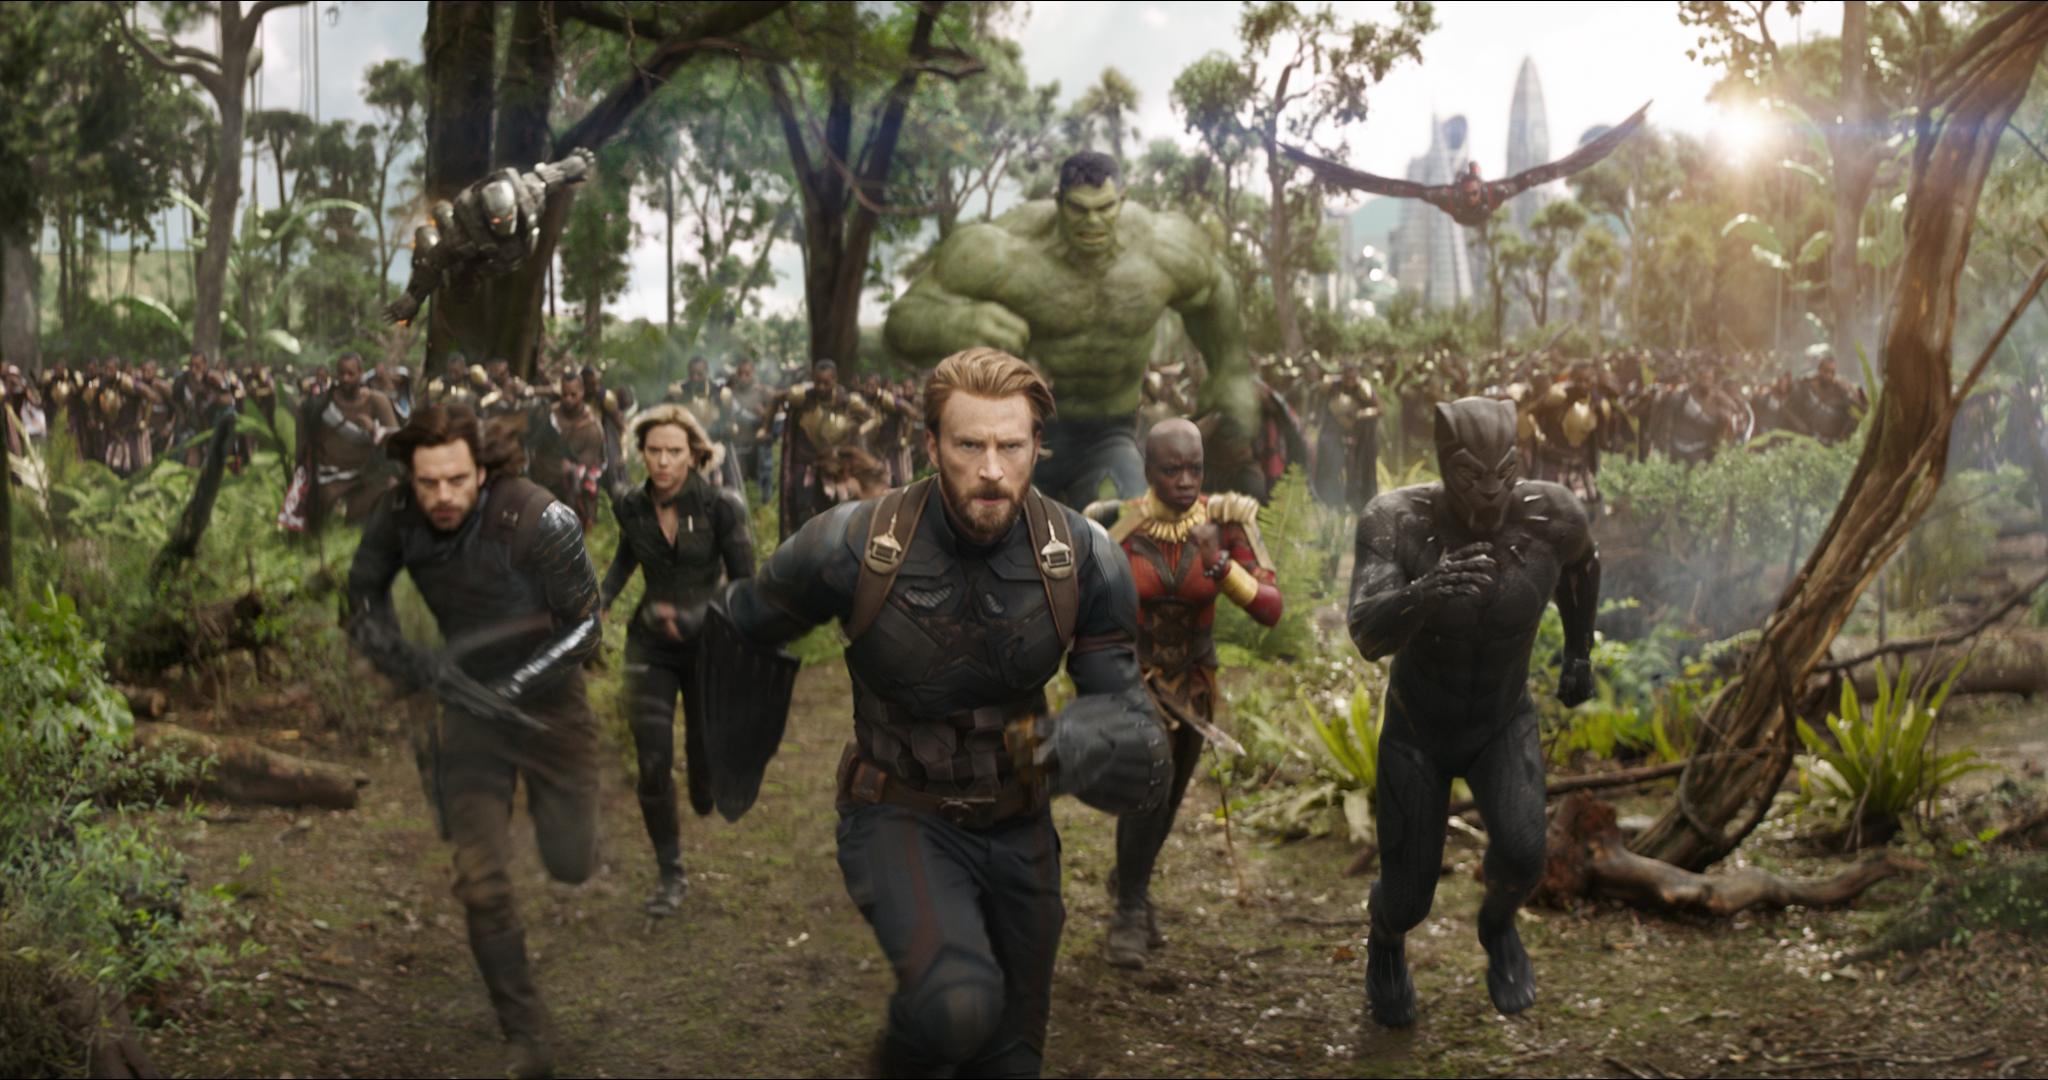 avengers infinity war image group - Avengers: Infinity War - La Reseña Cinergetica (Spoilers) y Análisis